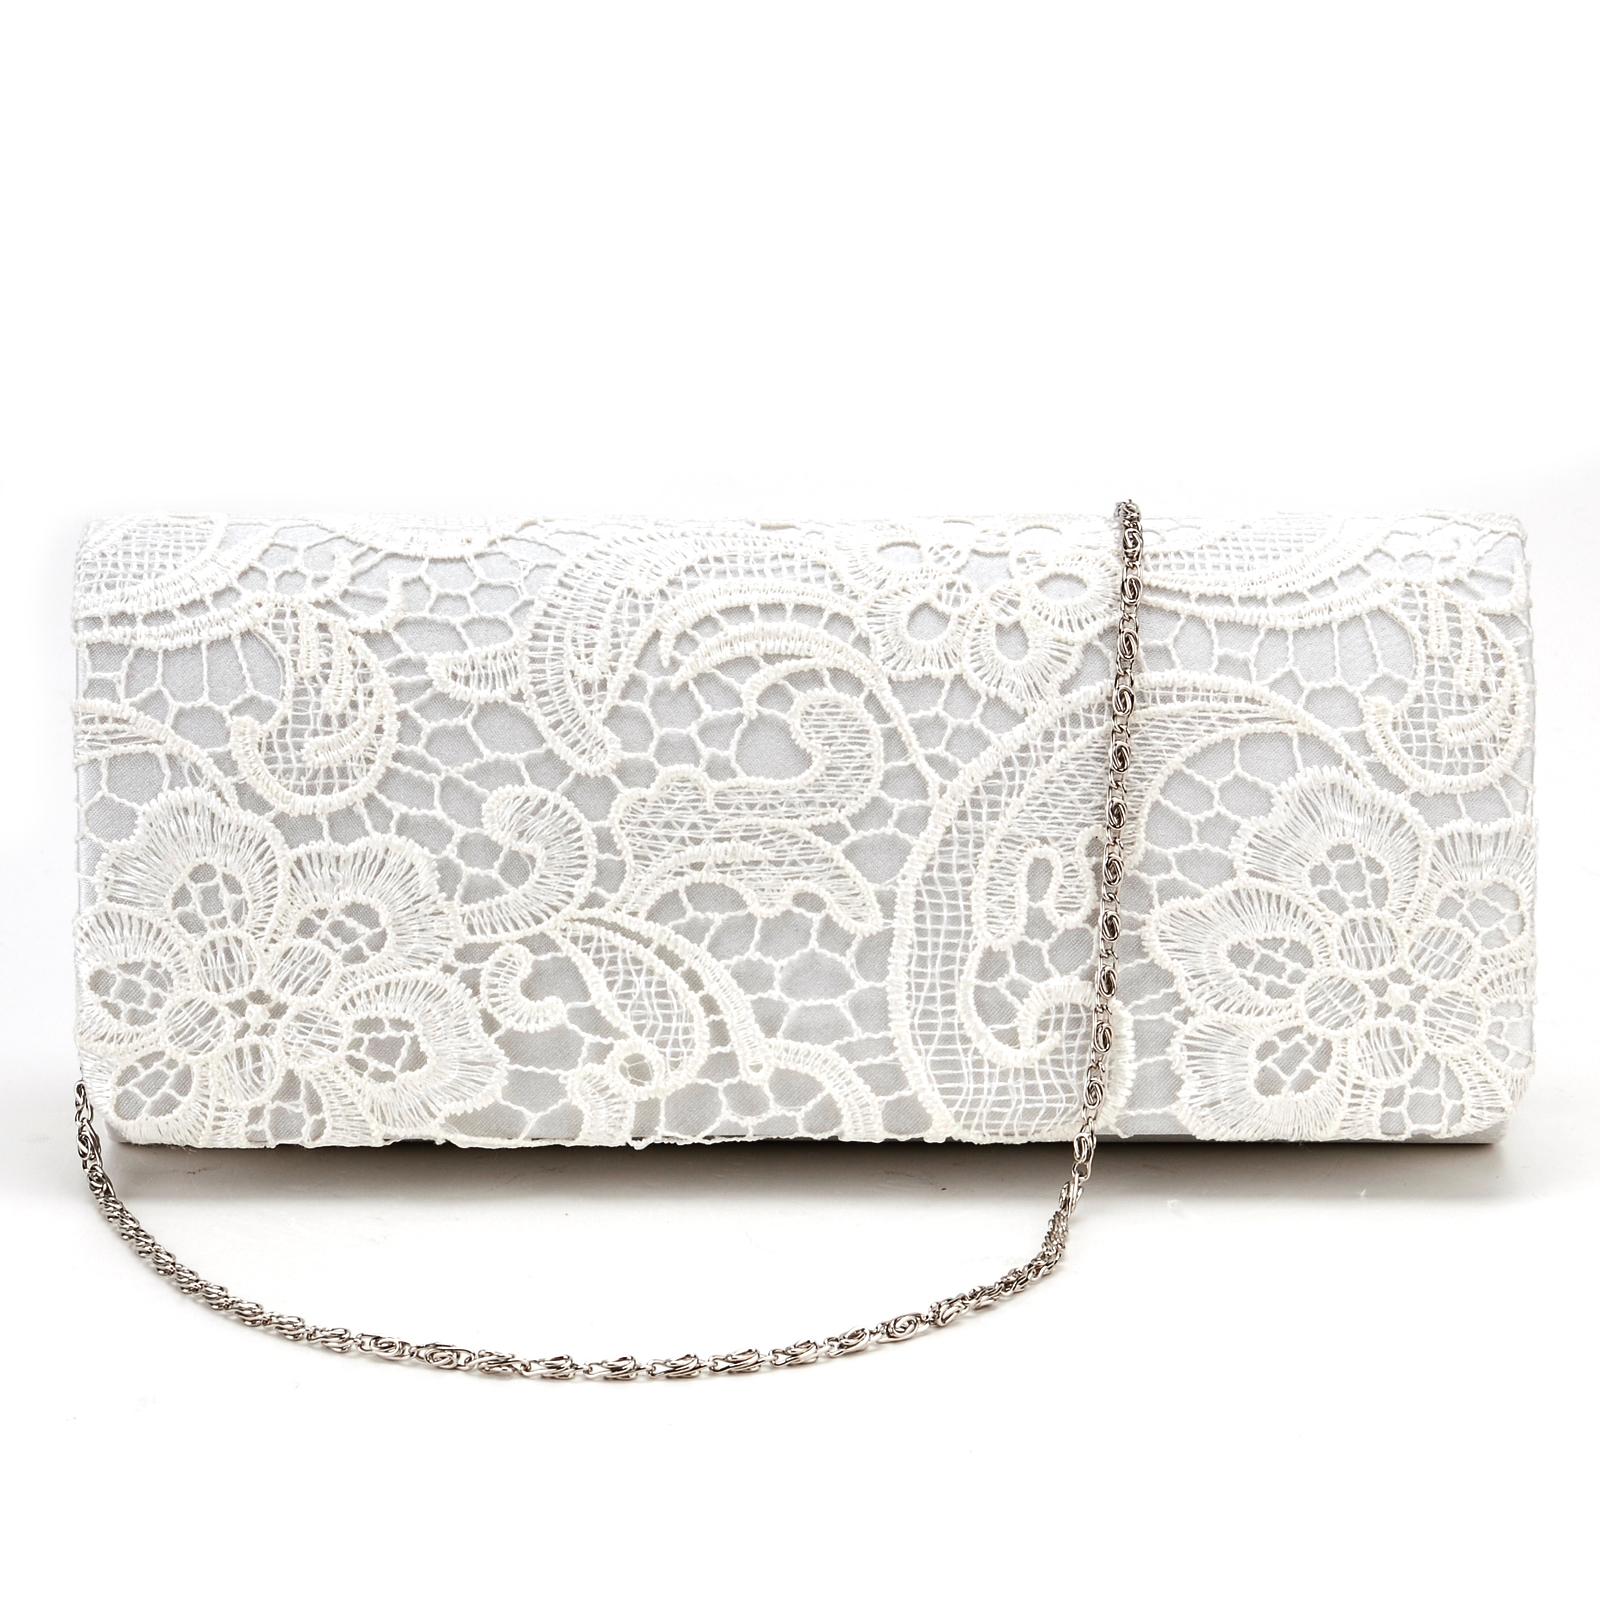 Satin Lace Floral Evening Clutch Bag Wedding Bridal Handbag Purse Ivory White | EBay